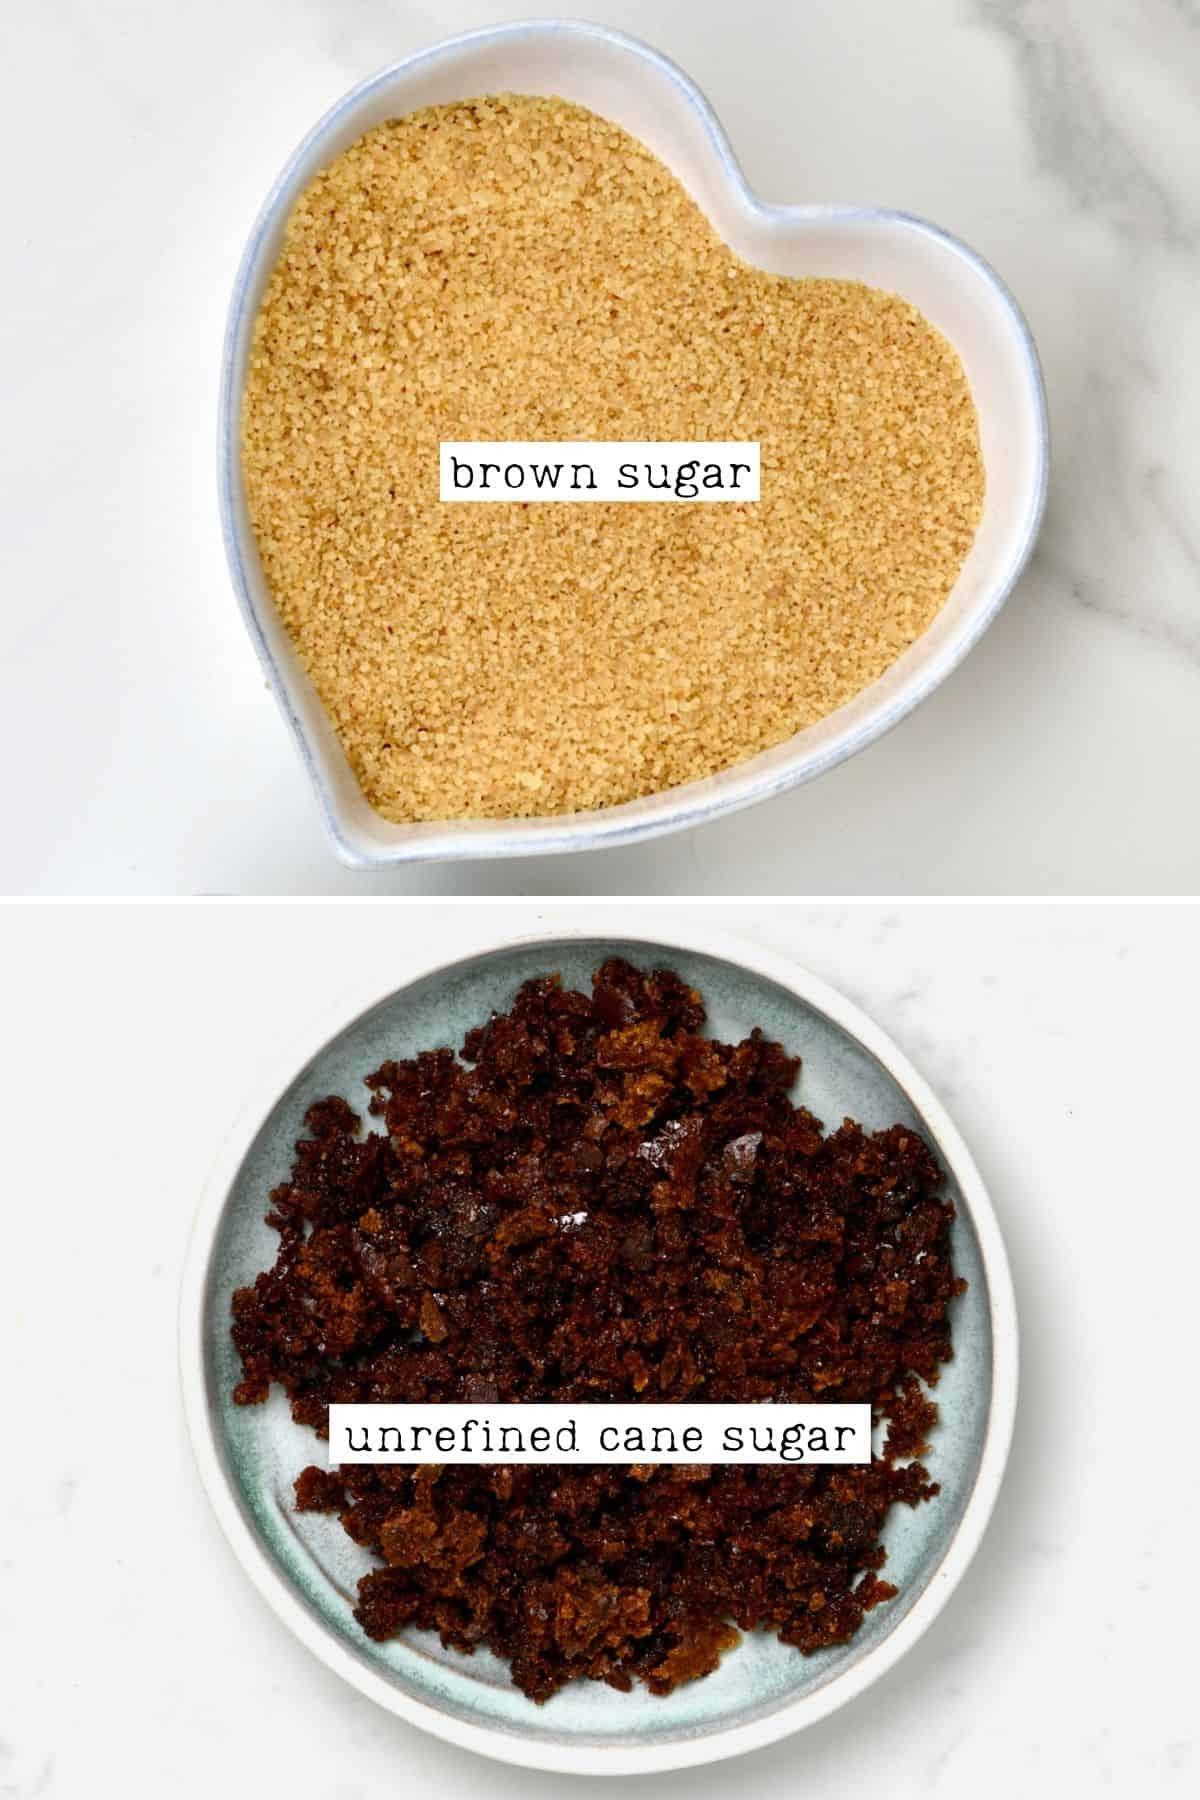 Brown sugar and unrefined cane sugar